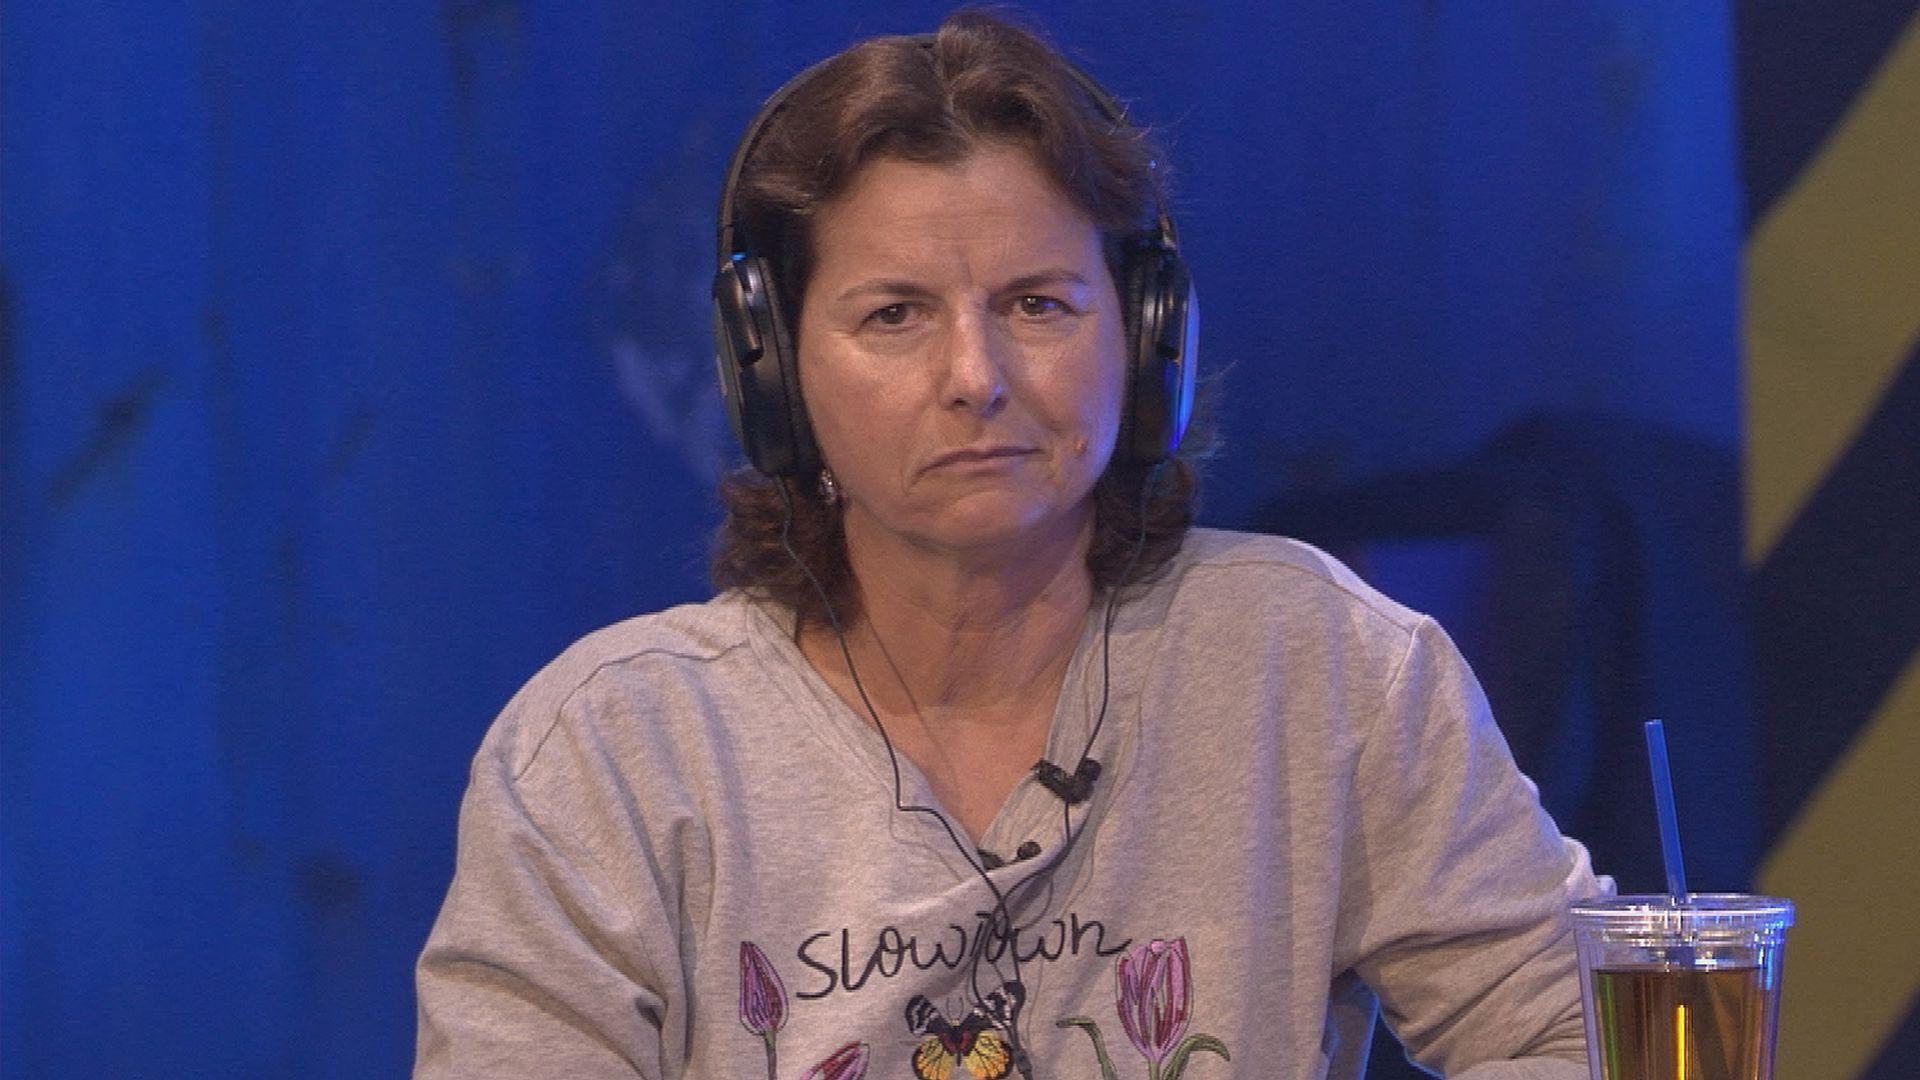 Dauer Blau Promi Bb Fans Lachen Claudia Obert Aus Promiflashde